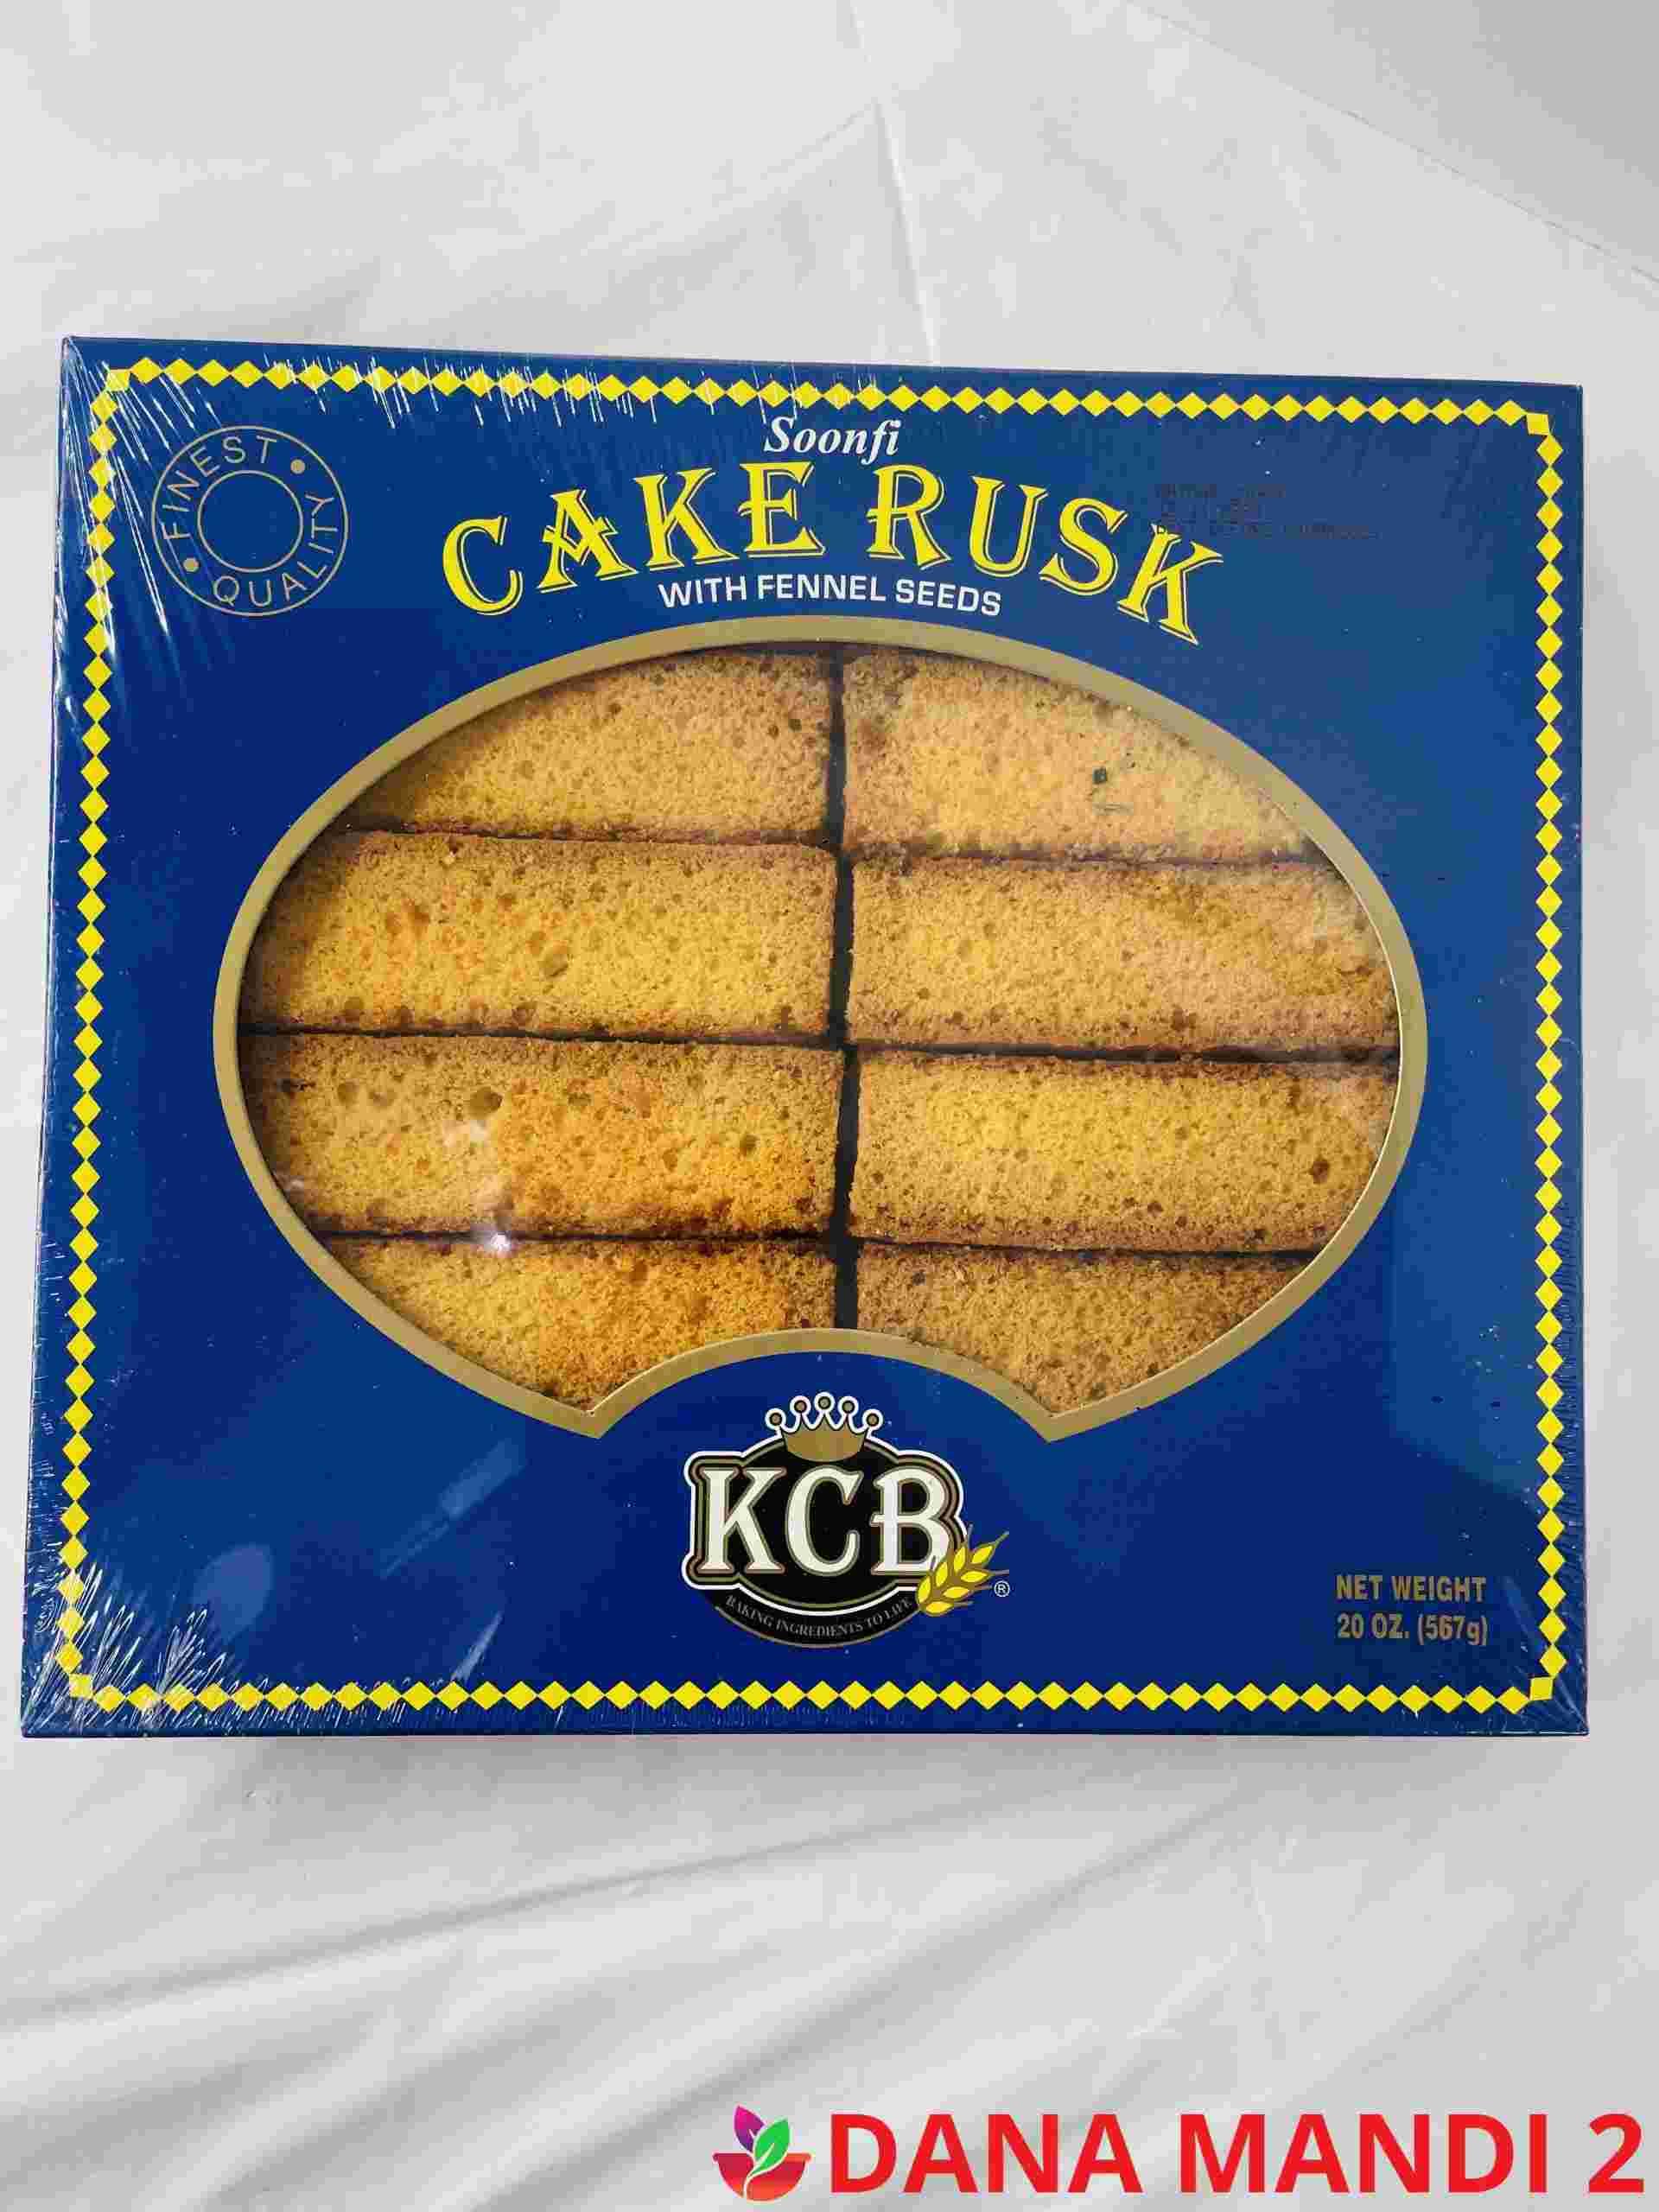 KCB Cake Rusk Soonfi  (Blue Box)